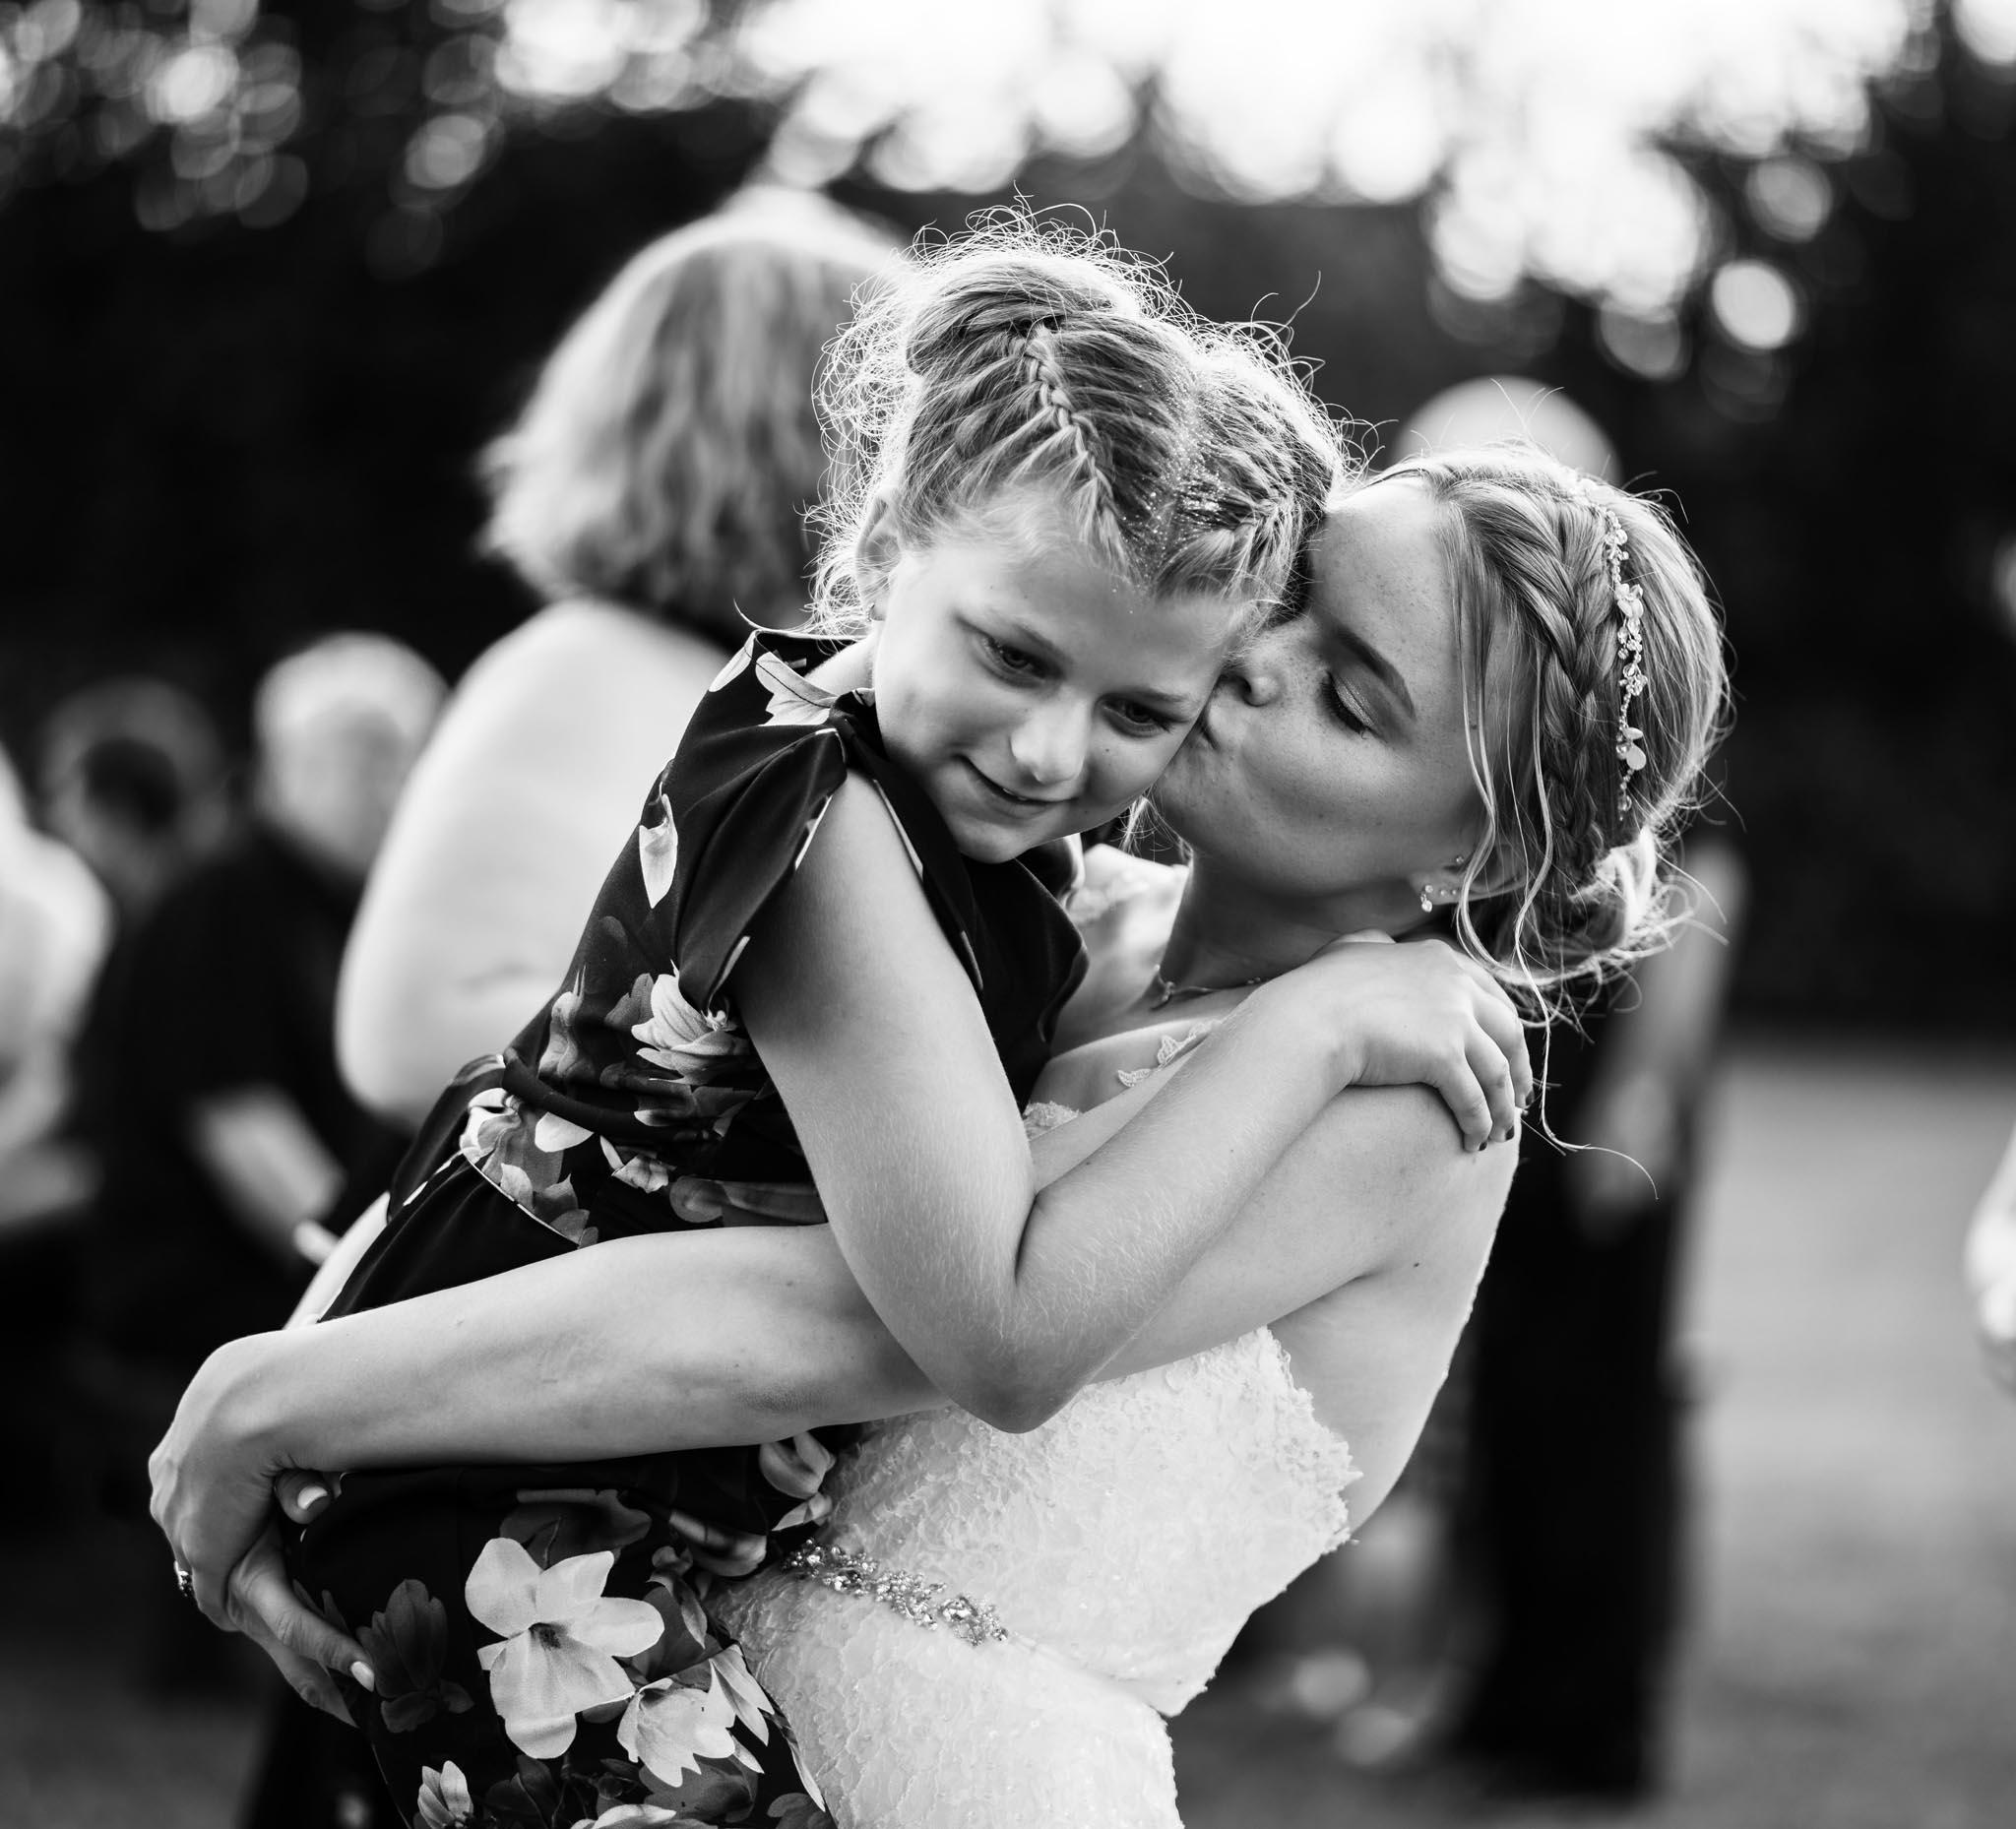 726-family-friends-Luke-Yasmin-The-Rayleigh-Club-Wedding-Photography.jpg